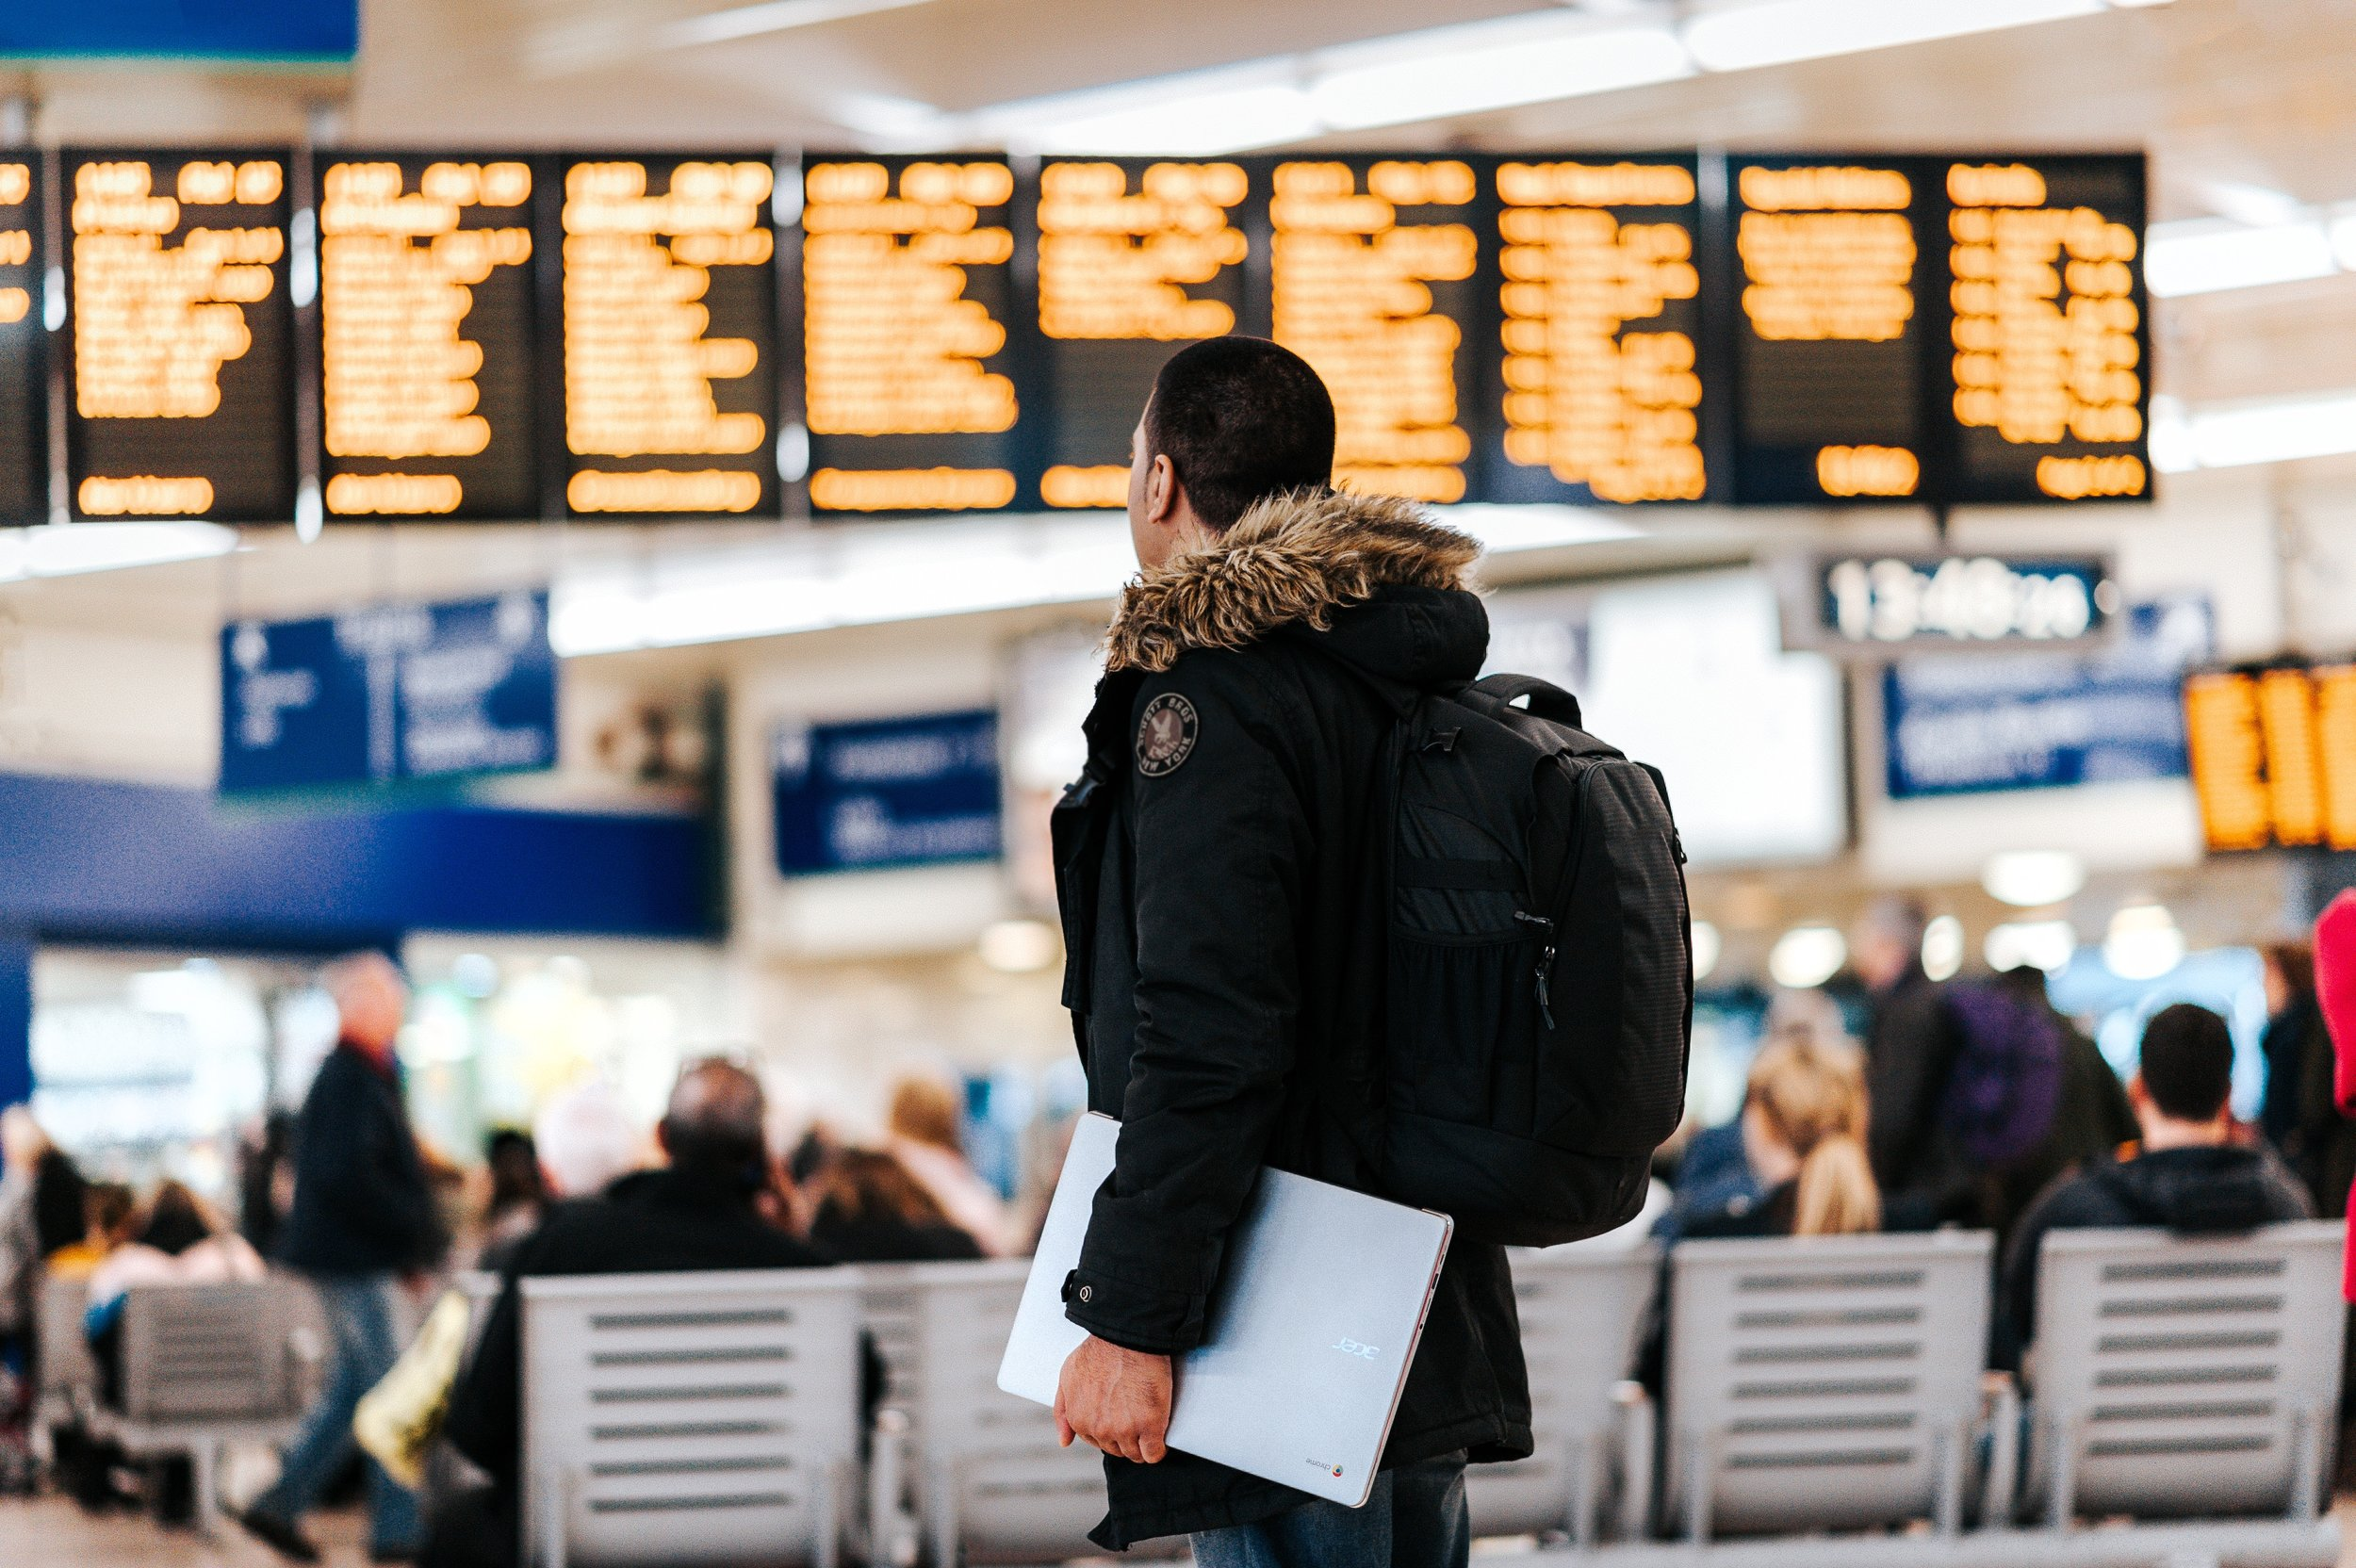 virtual-assistant-airport.jpg